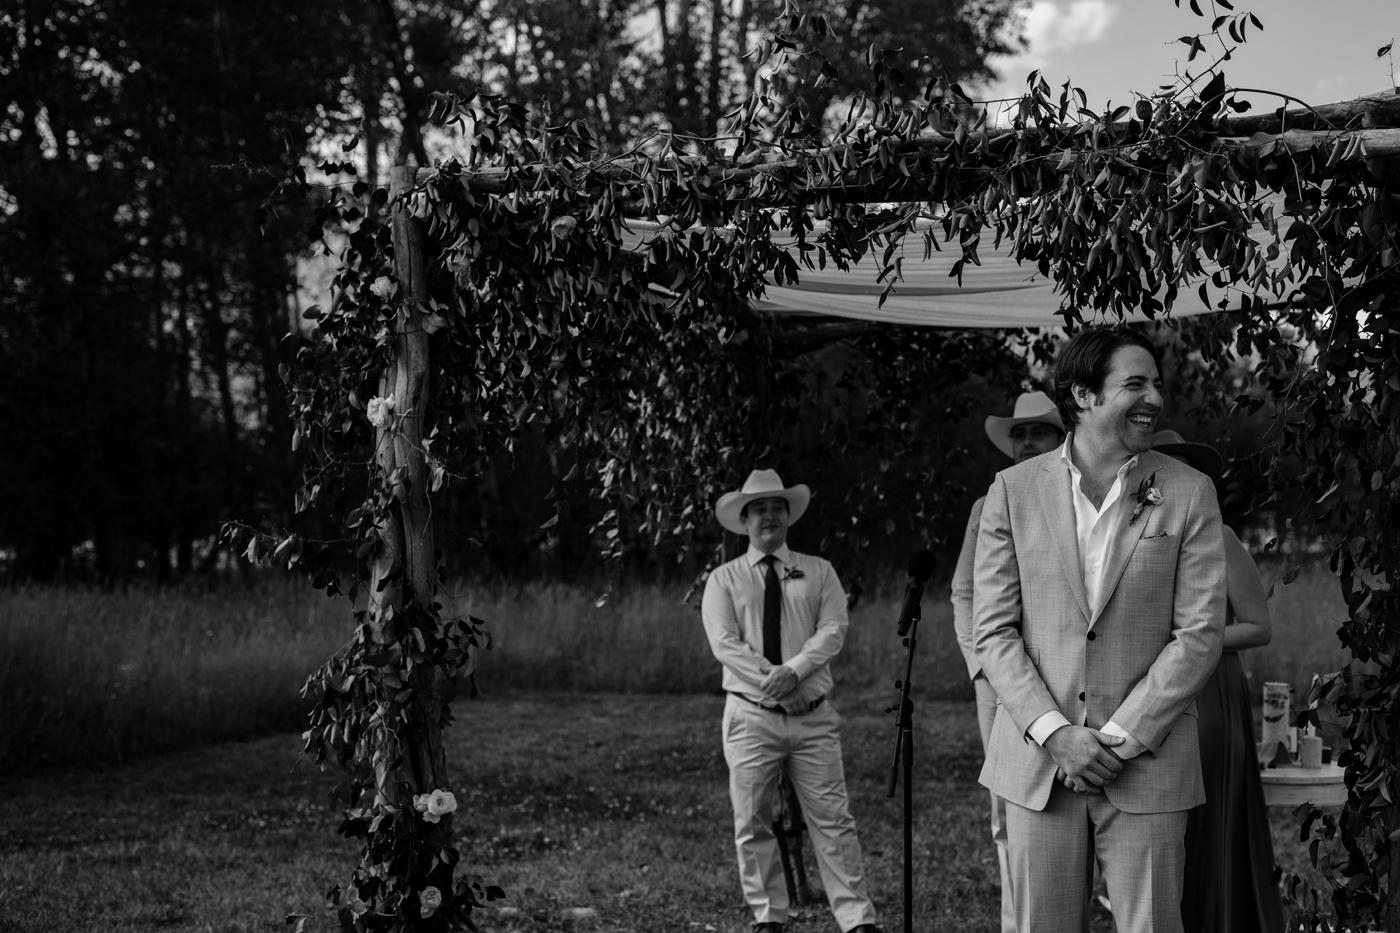 023-grand-teton-jackson-hole-wyoming-wedding.jpg